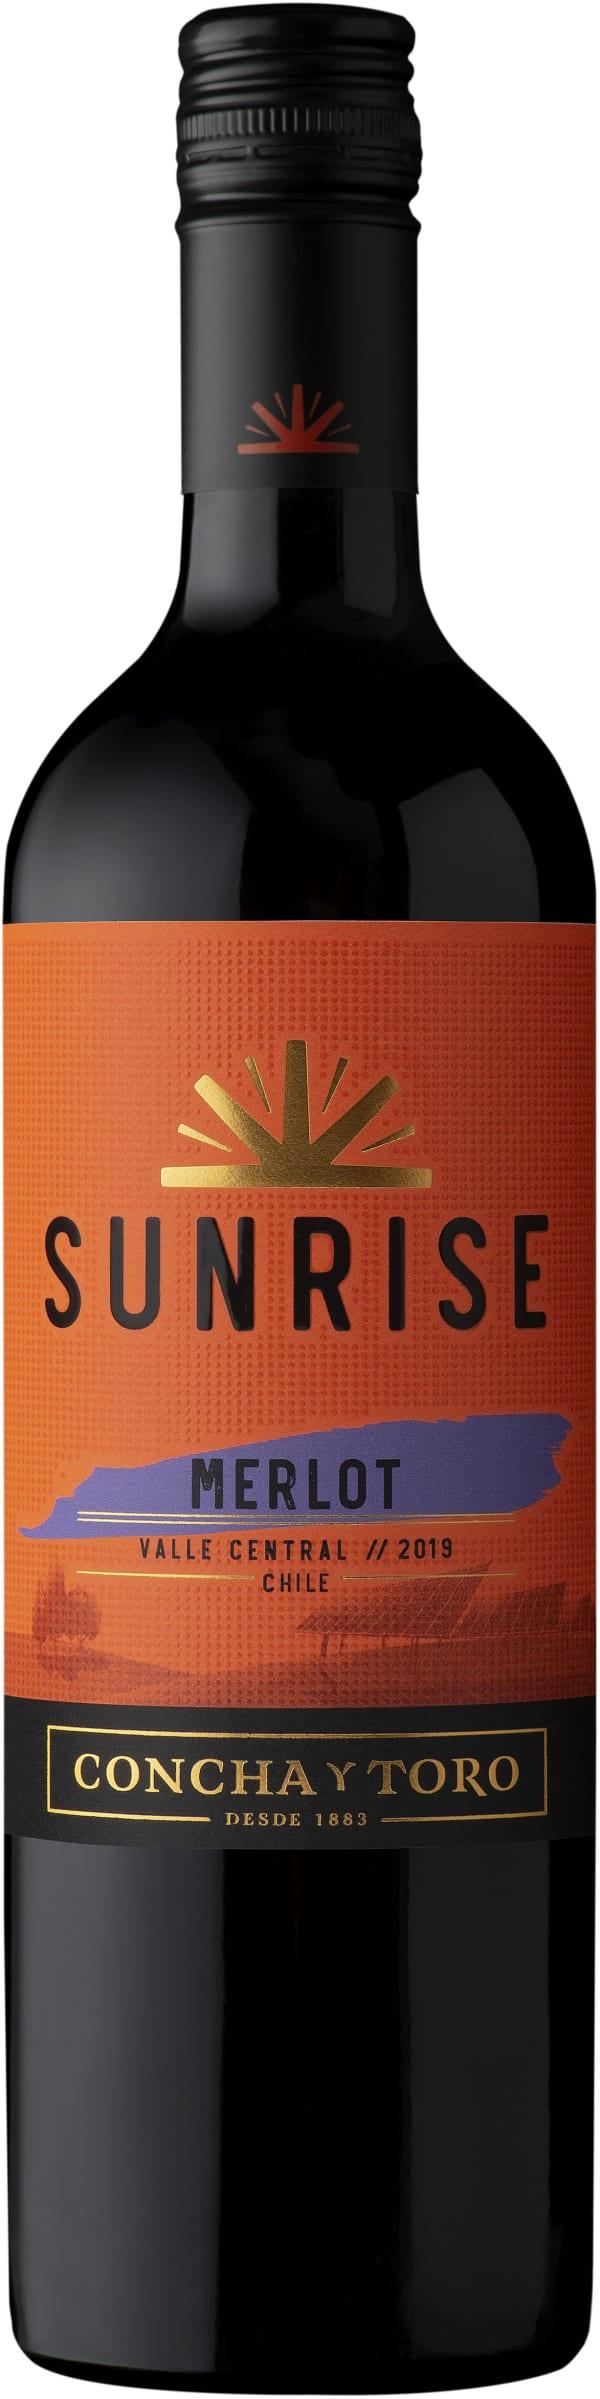 Sunrise Merlot 2016